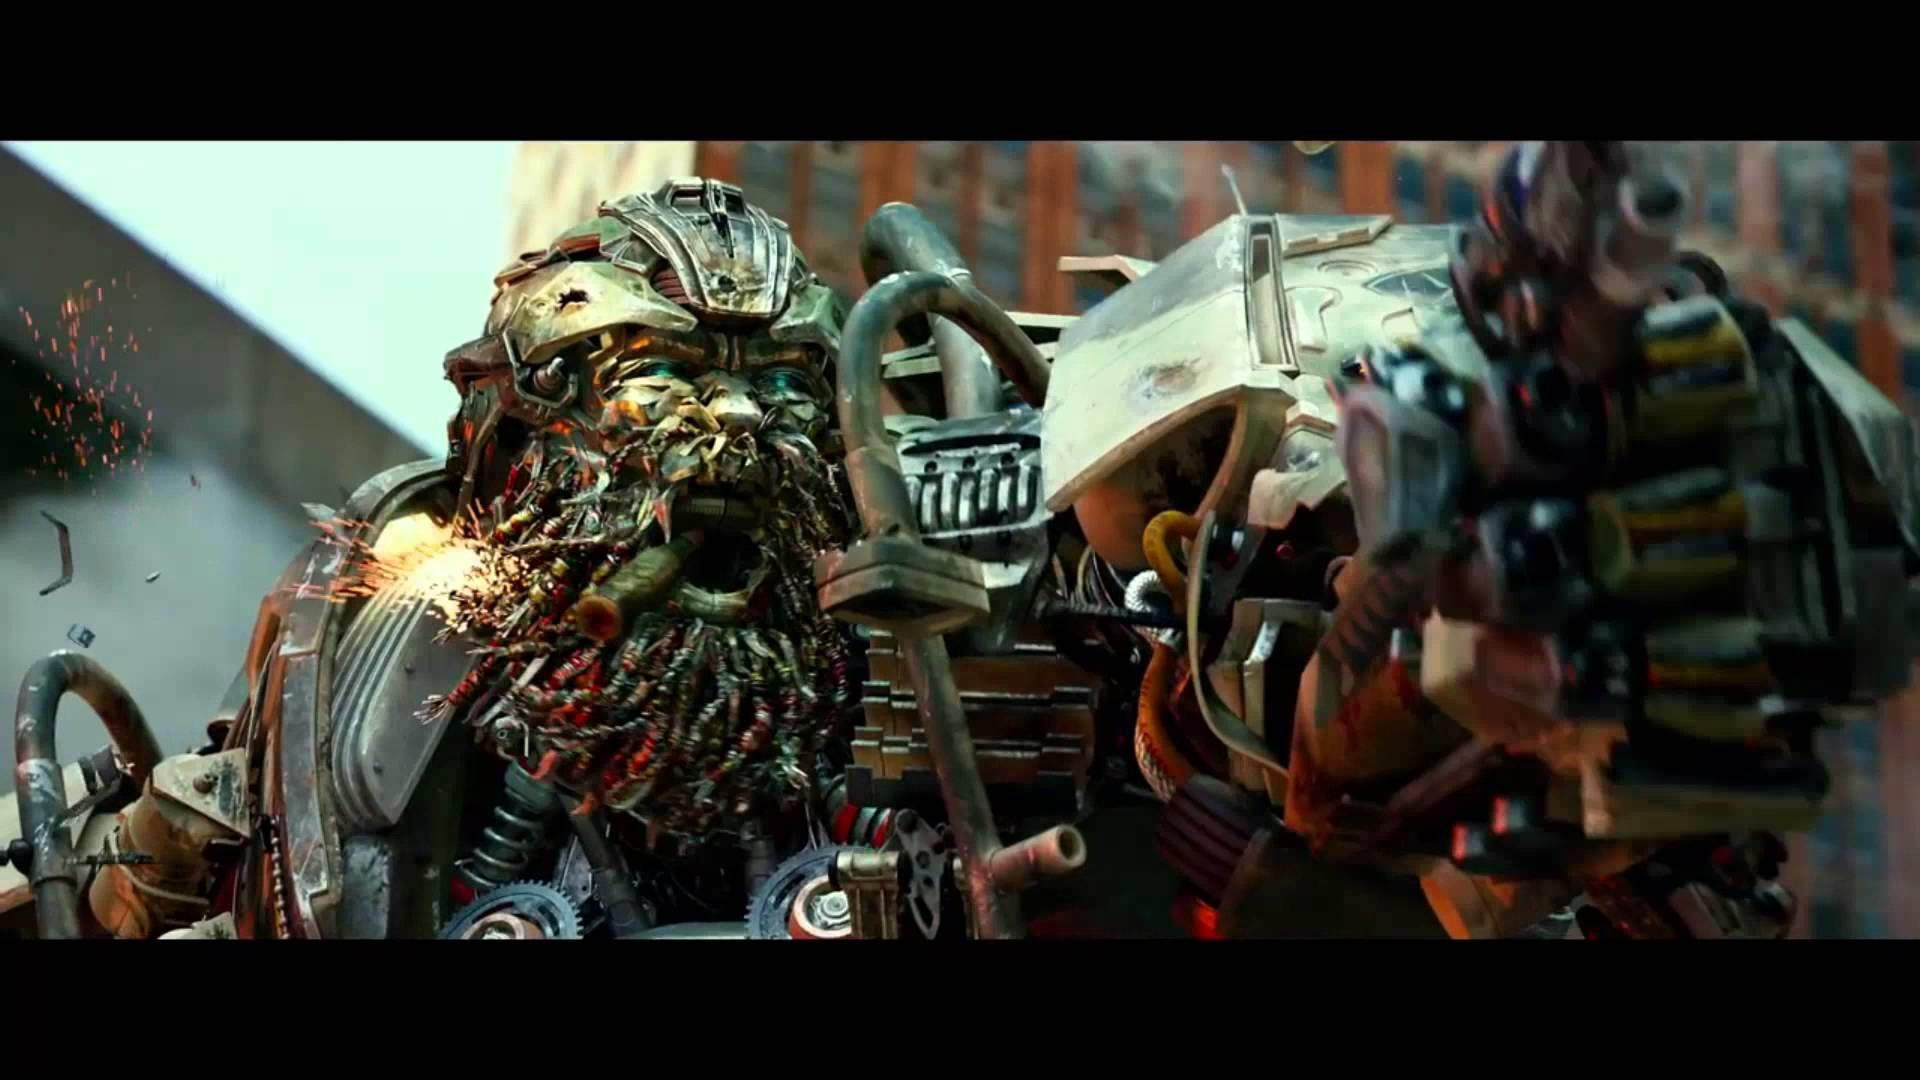 hound transformers hd